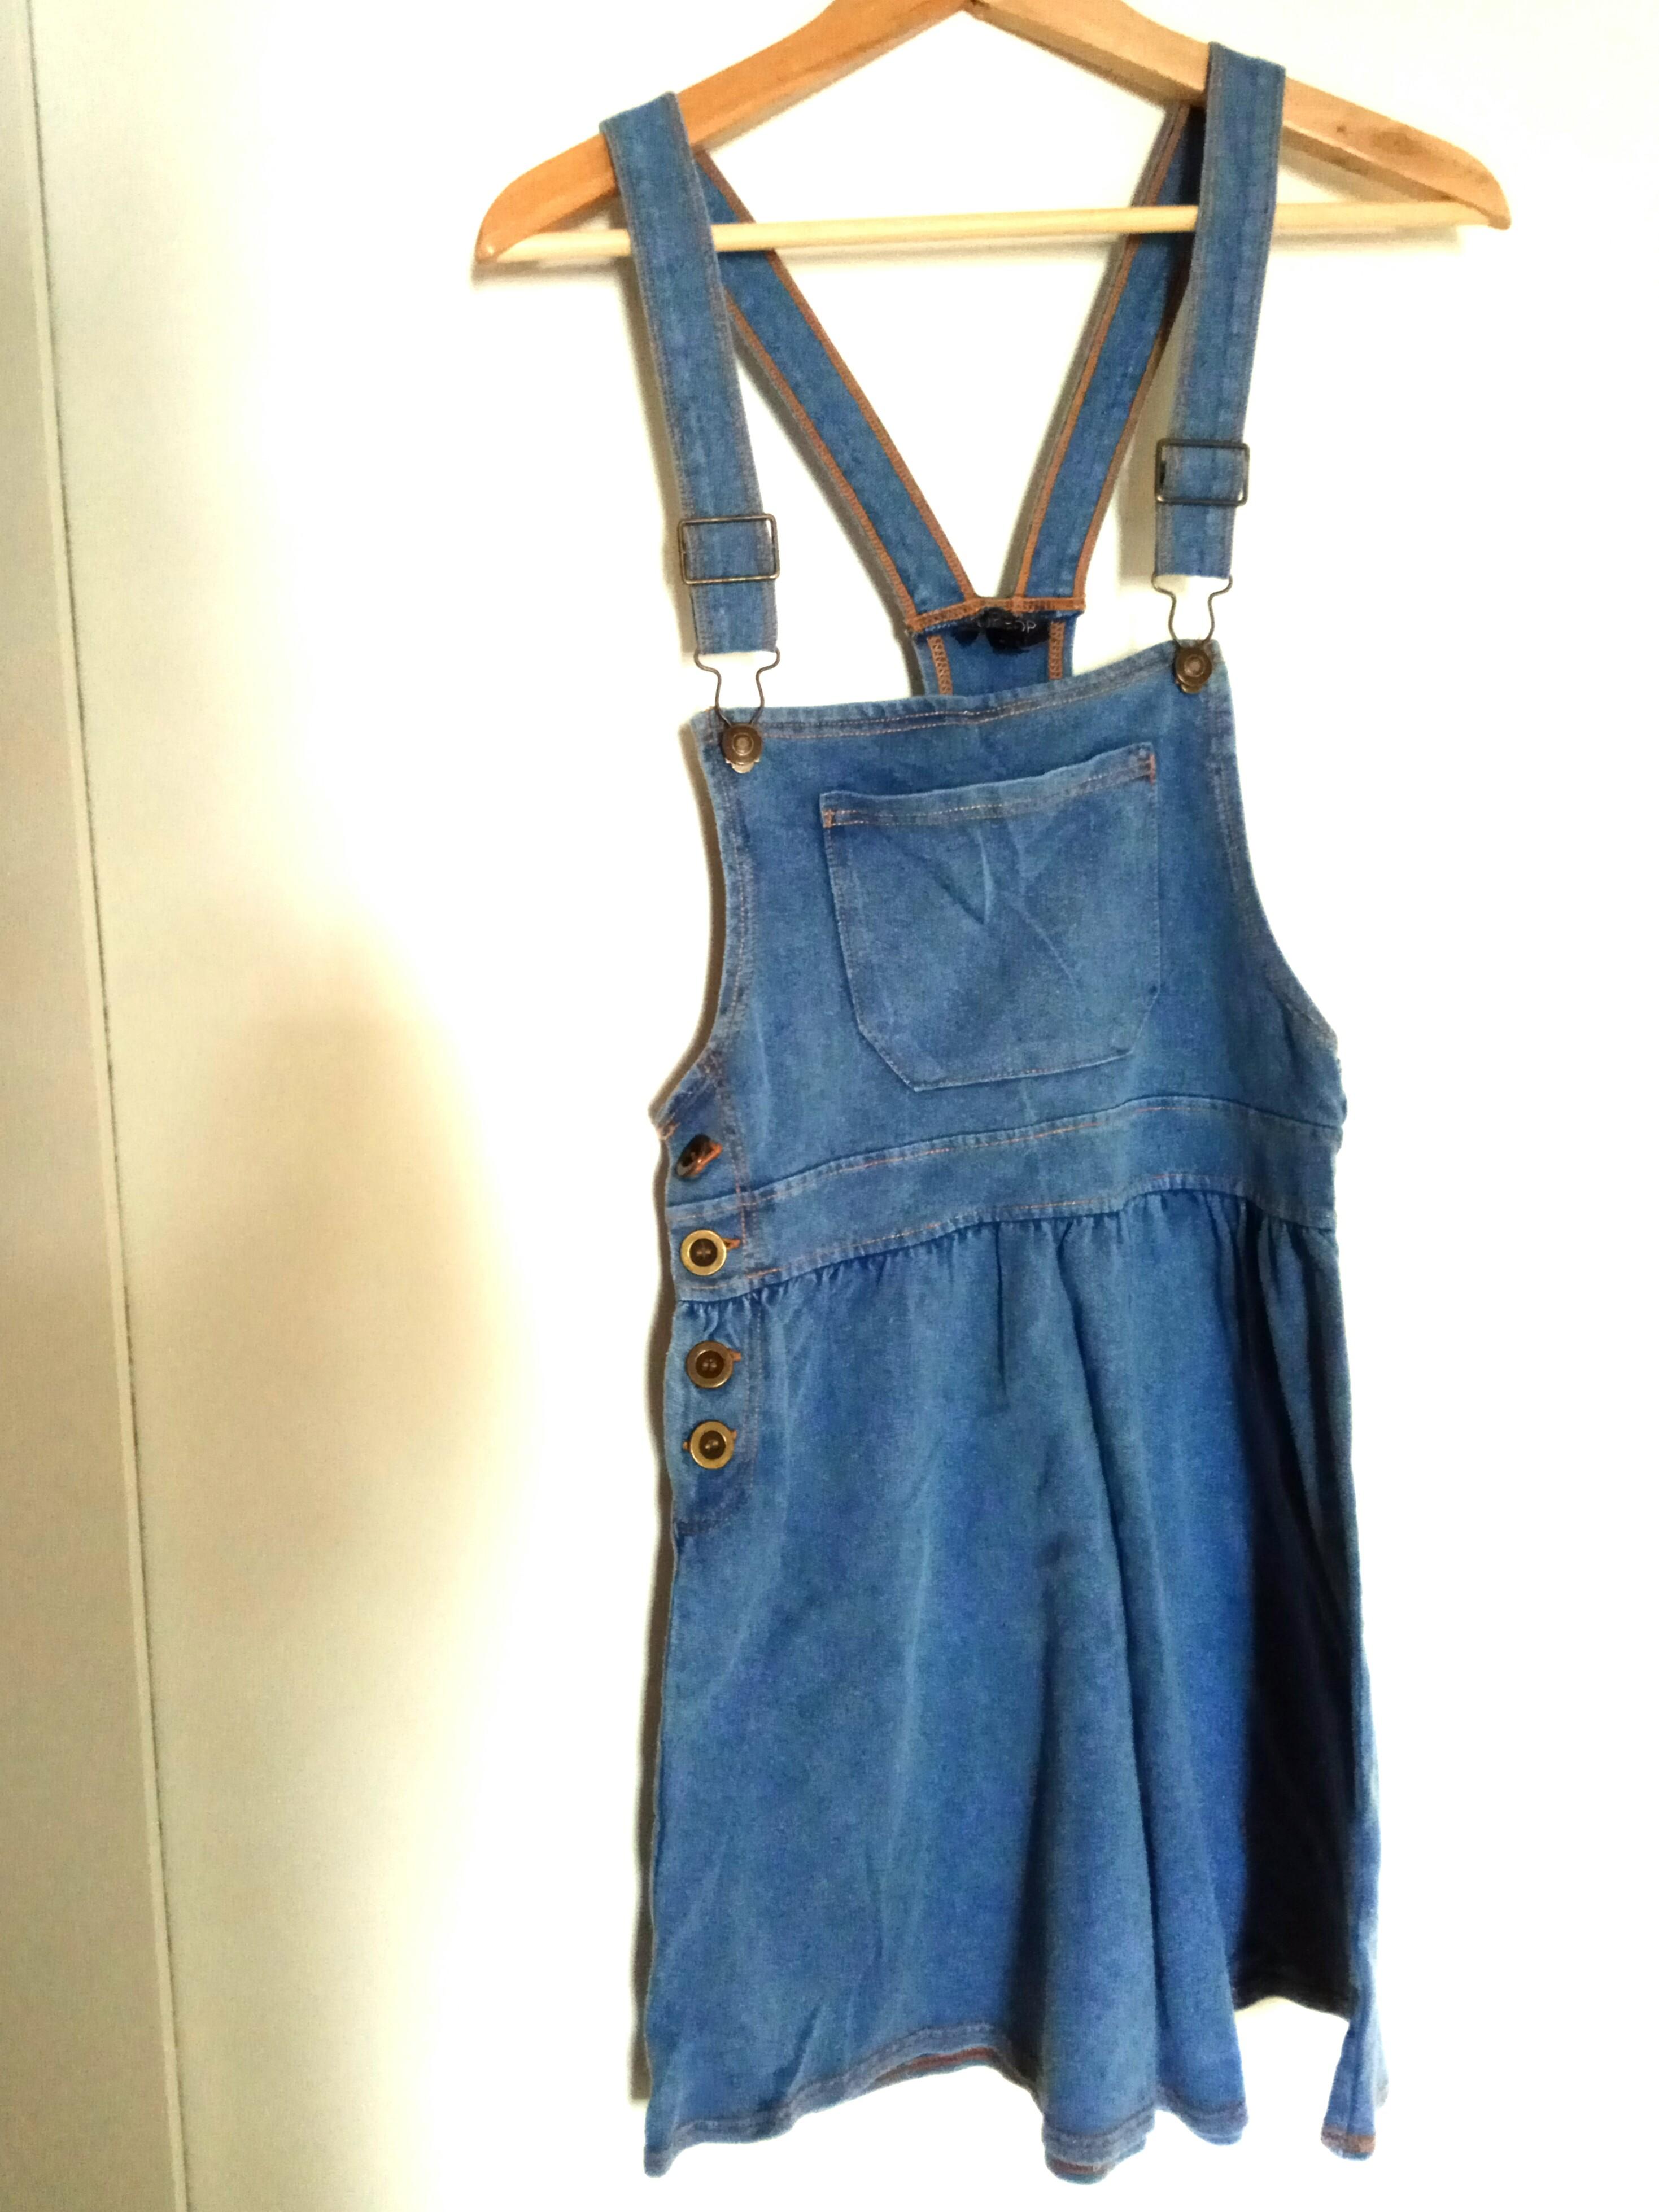 8879e41fca Topshop Denim Overalls, Women's Fashion, Clothes, Rompers ...